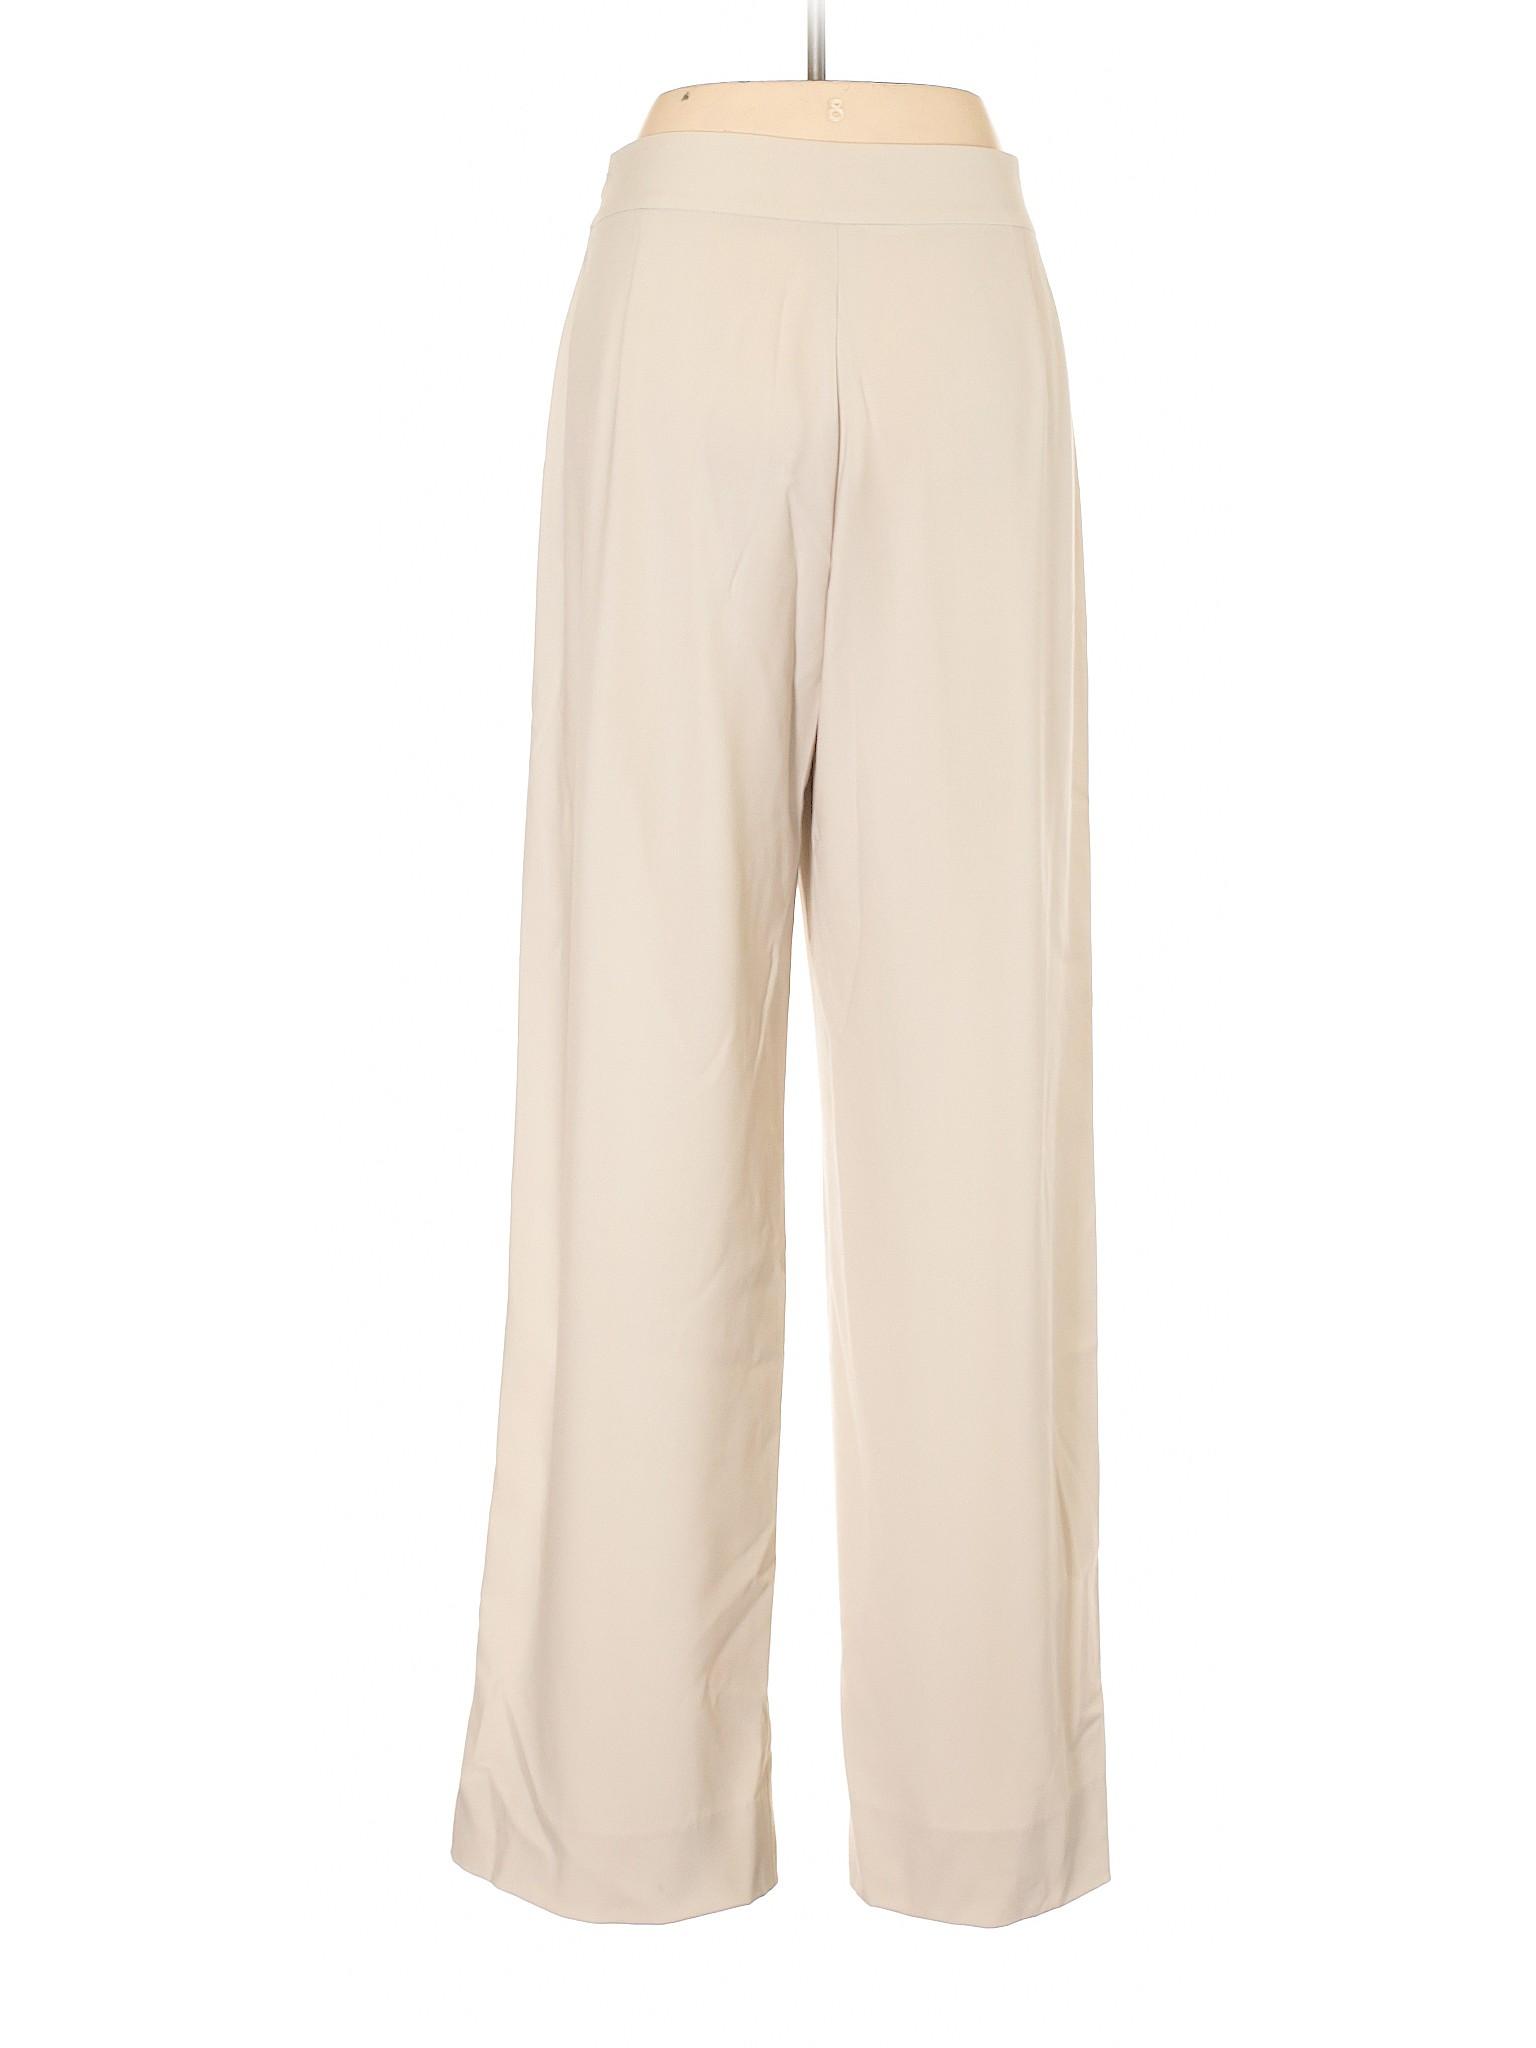 Wool leisure Giorgio Pants Boutique Armani nBx0Z8RnS